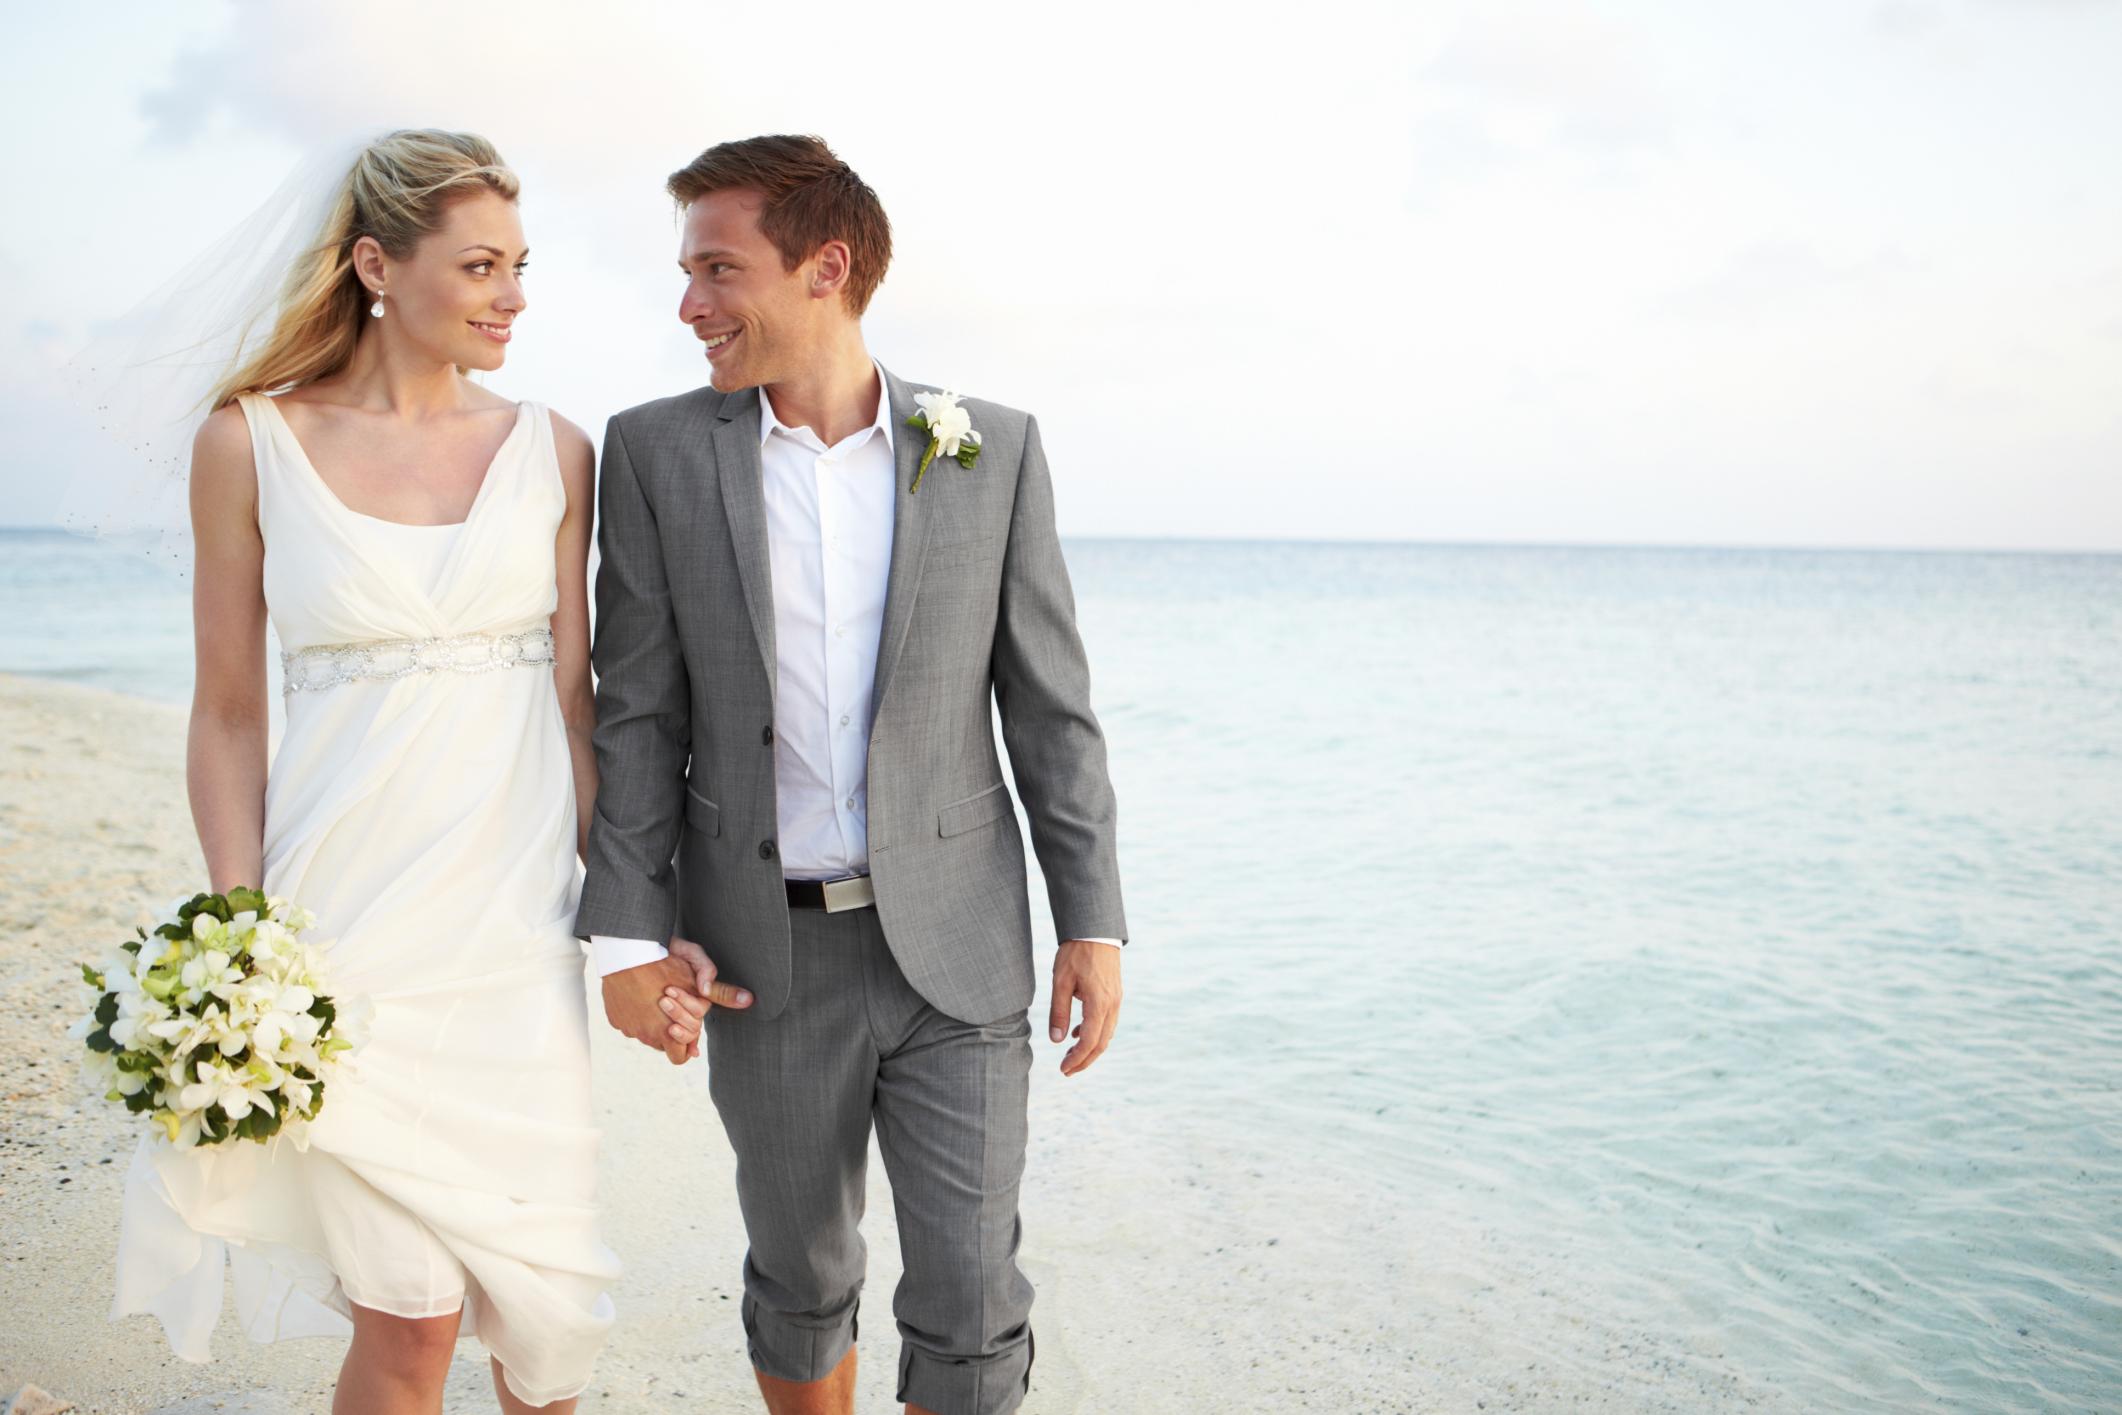 Mens Summer Wedding Attire.Mens Wedding Fashion Articles Easy Weddings